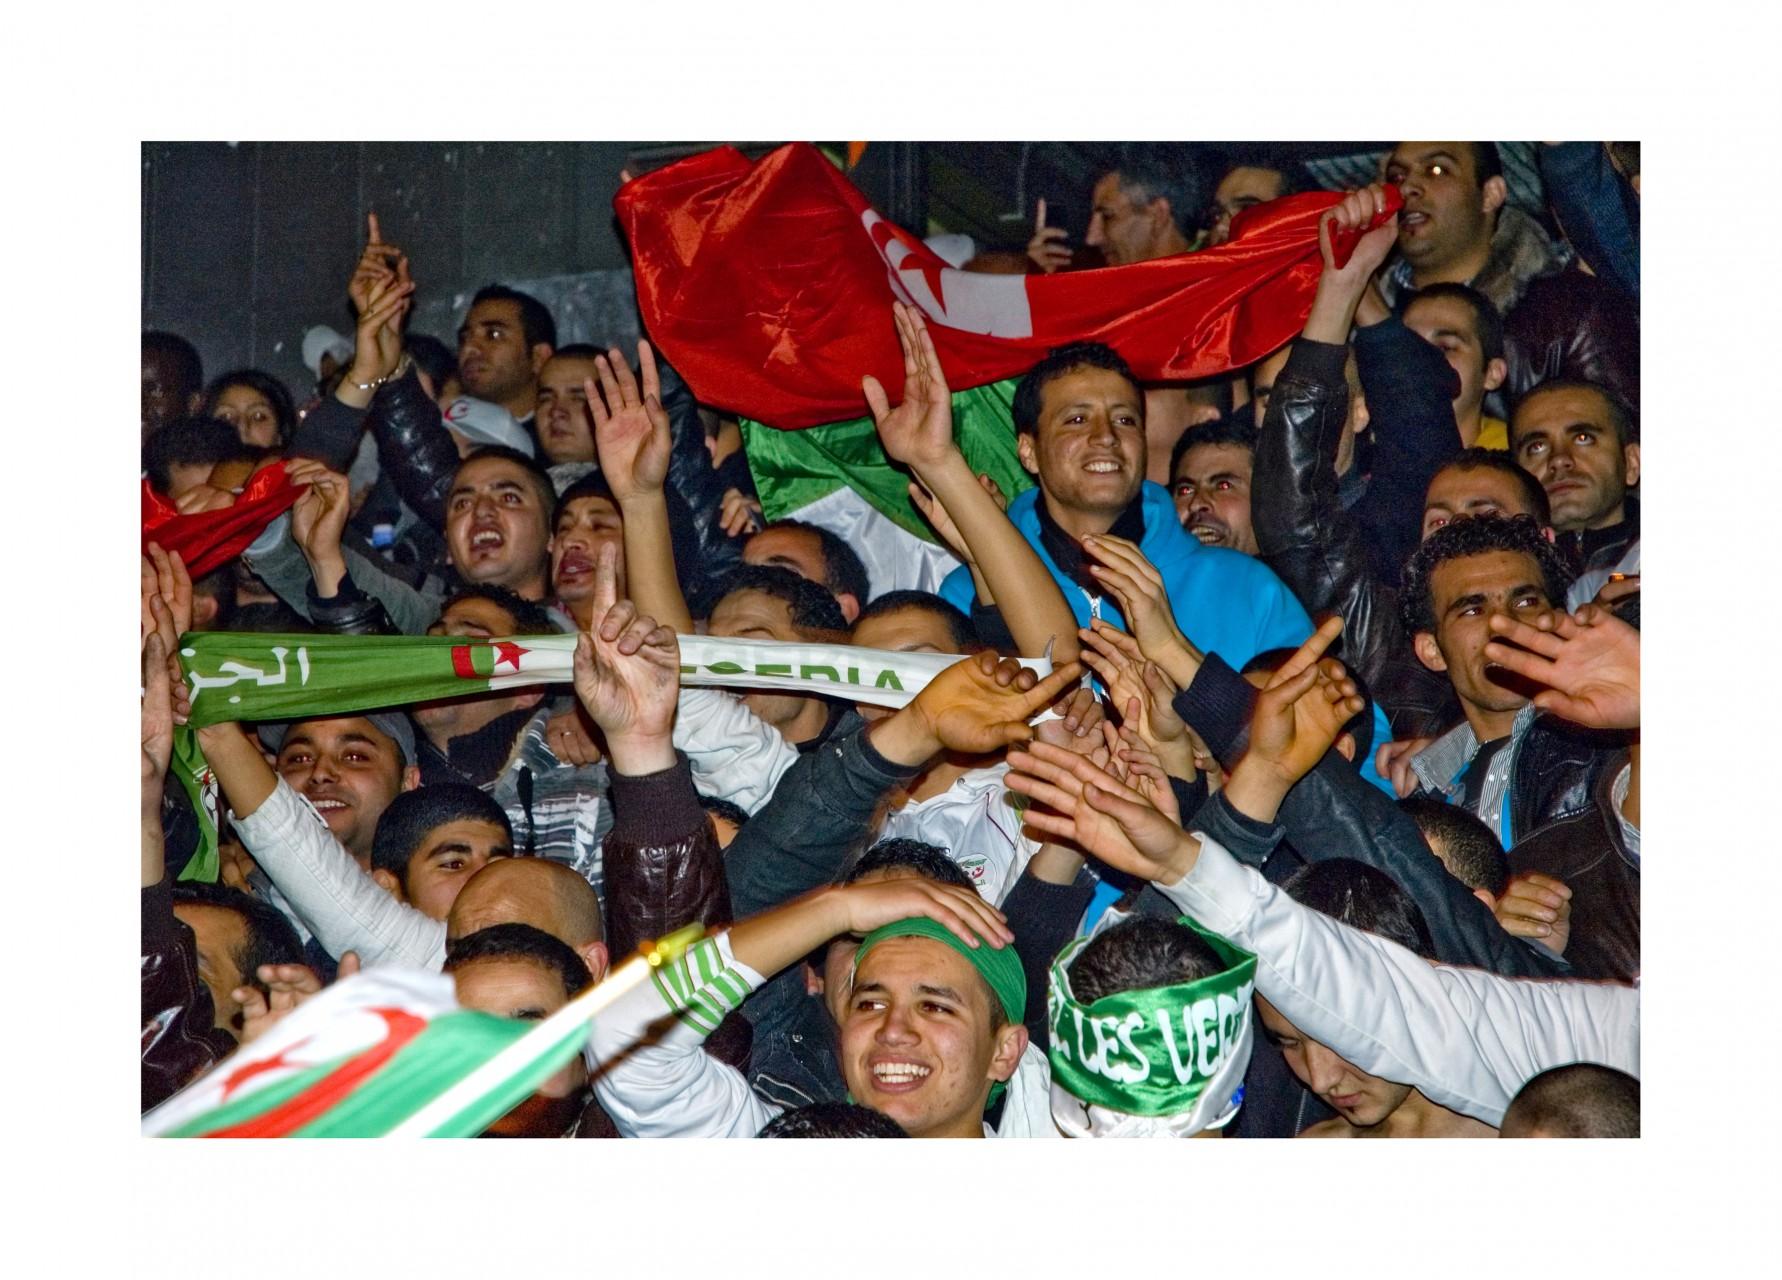 Manifestation sportive à Barbes - France